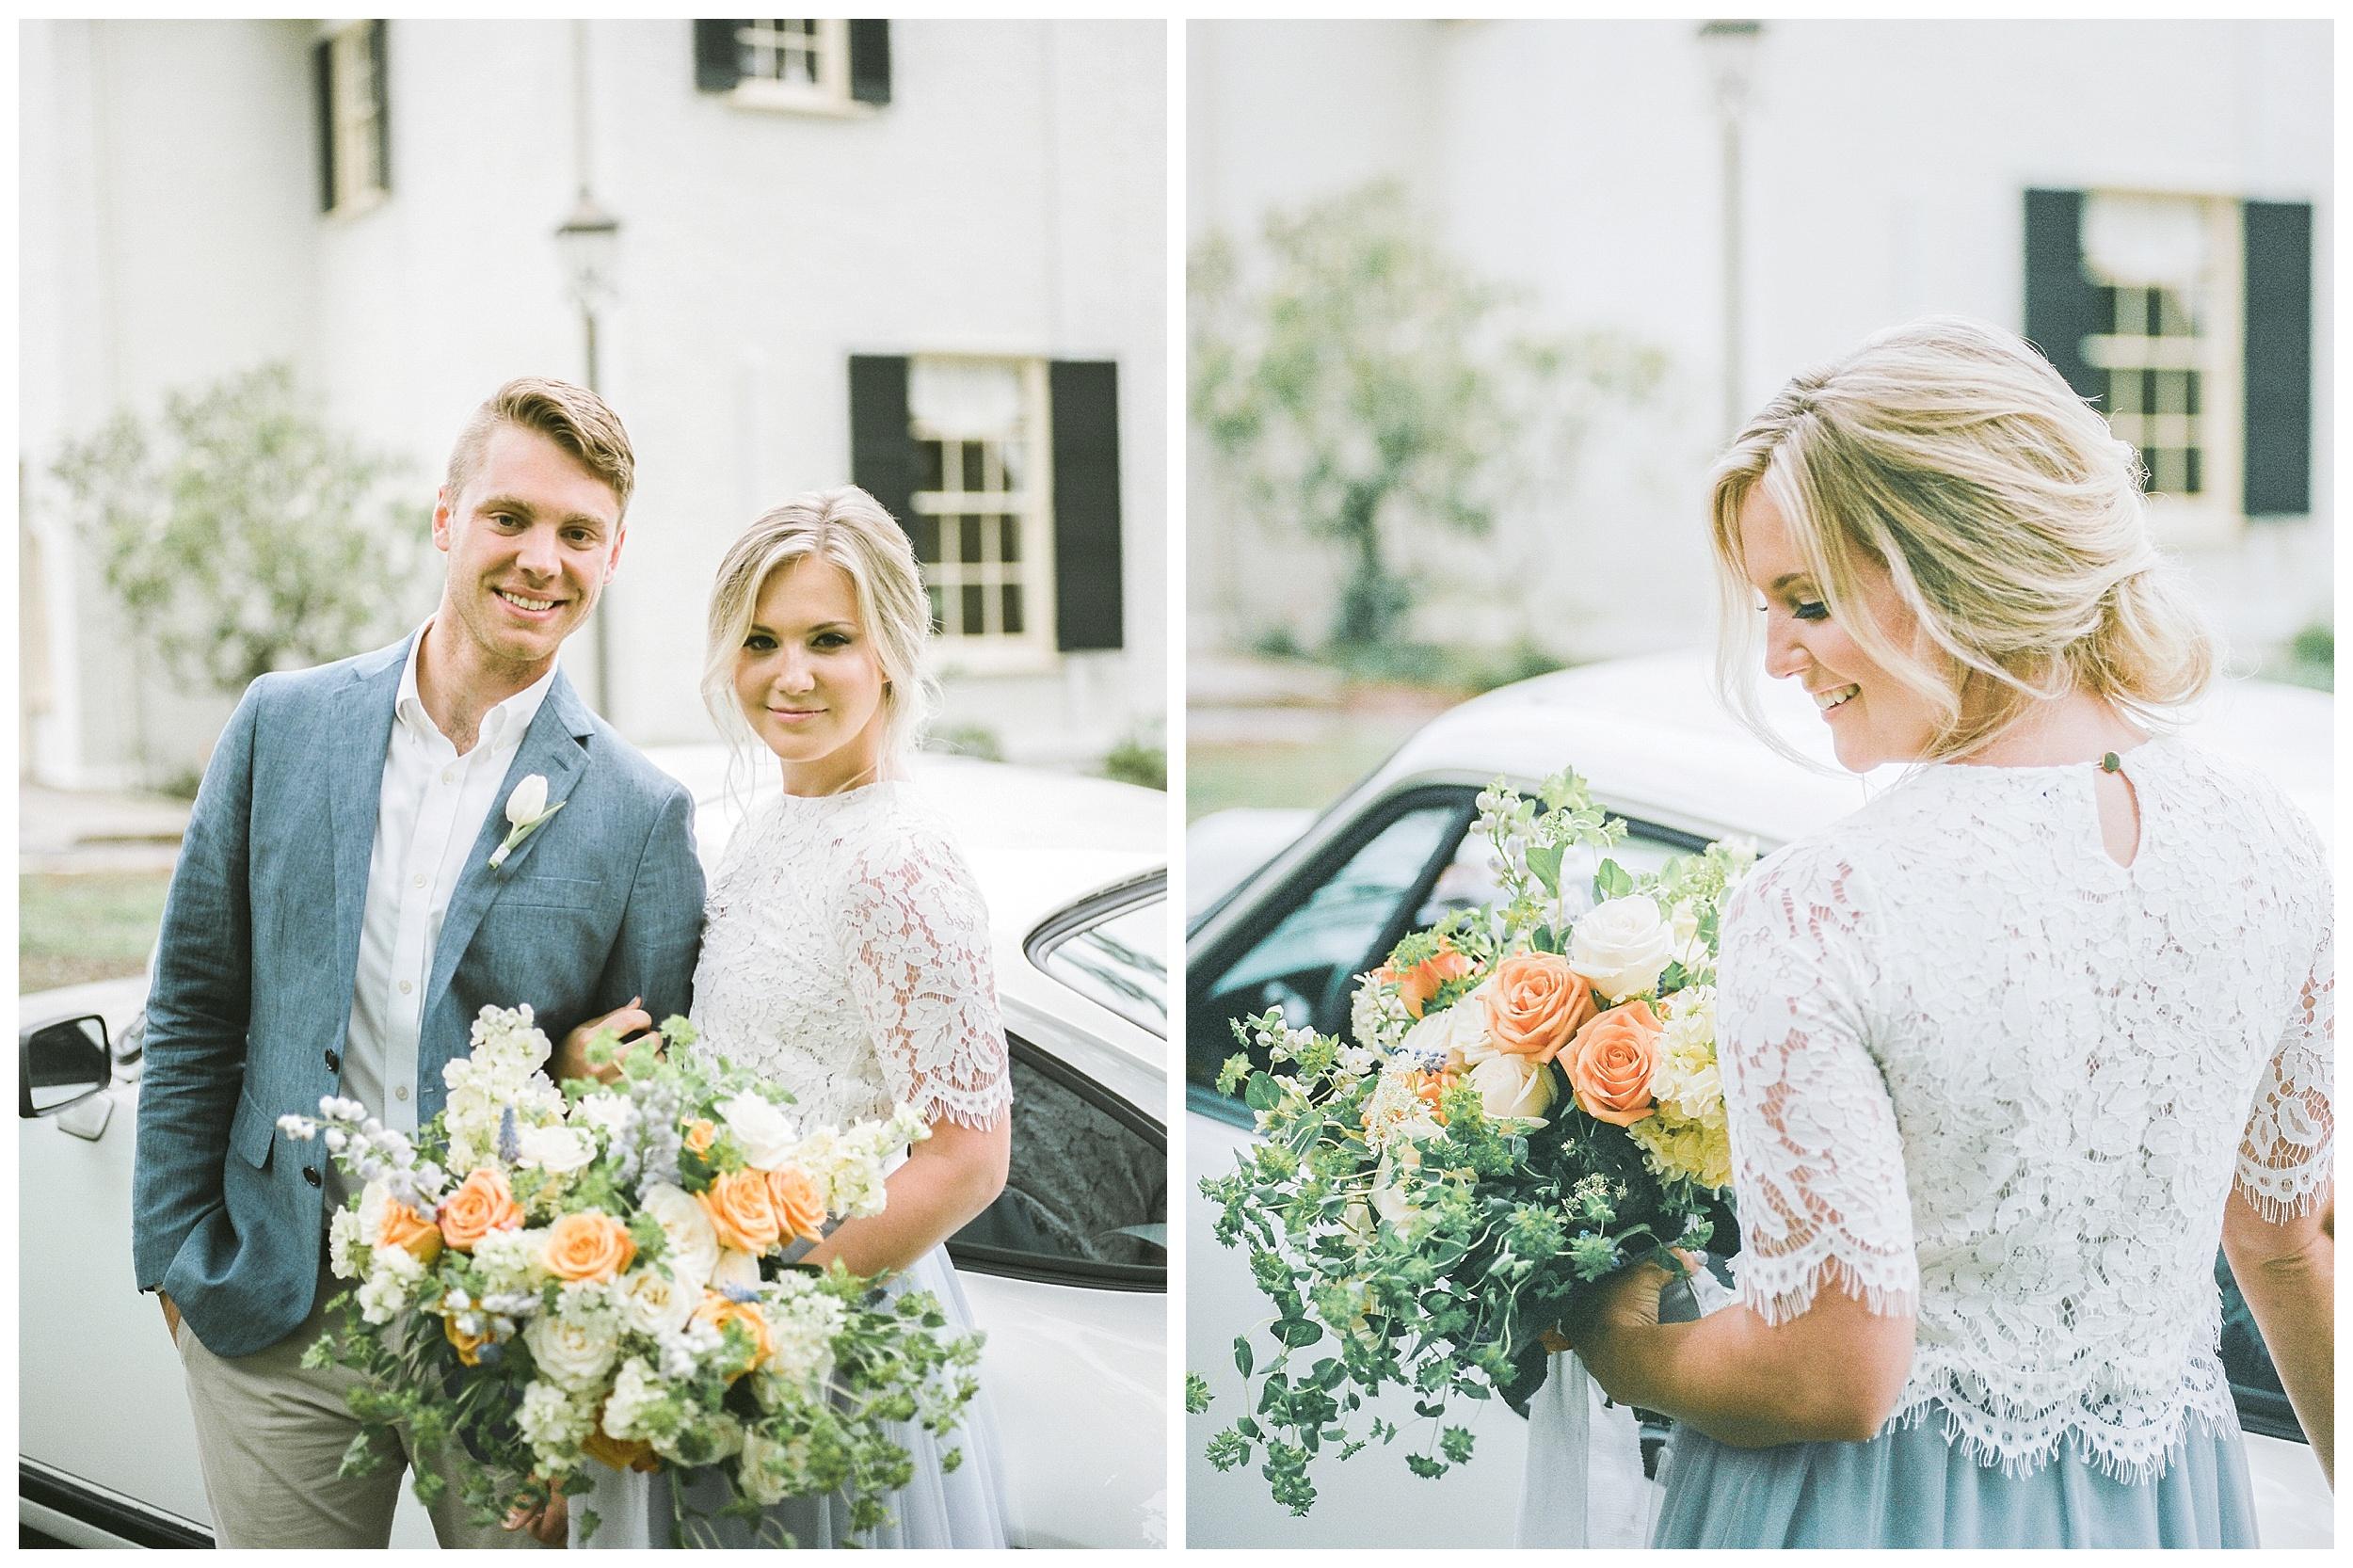 Rust Manor Wedding   Virginia Wedding Photographer Kir Tuben_0055.jpg